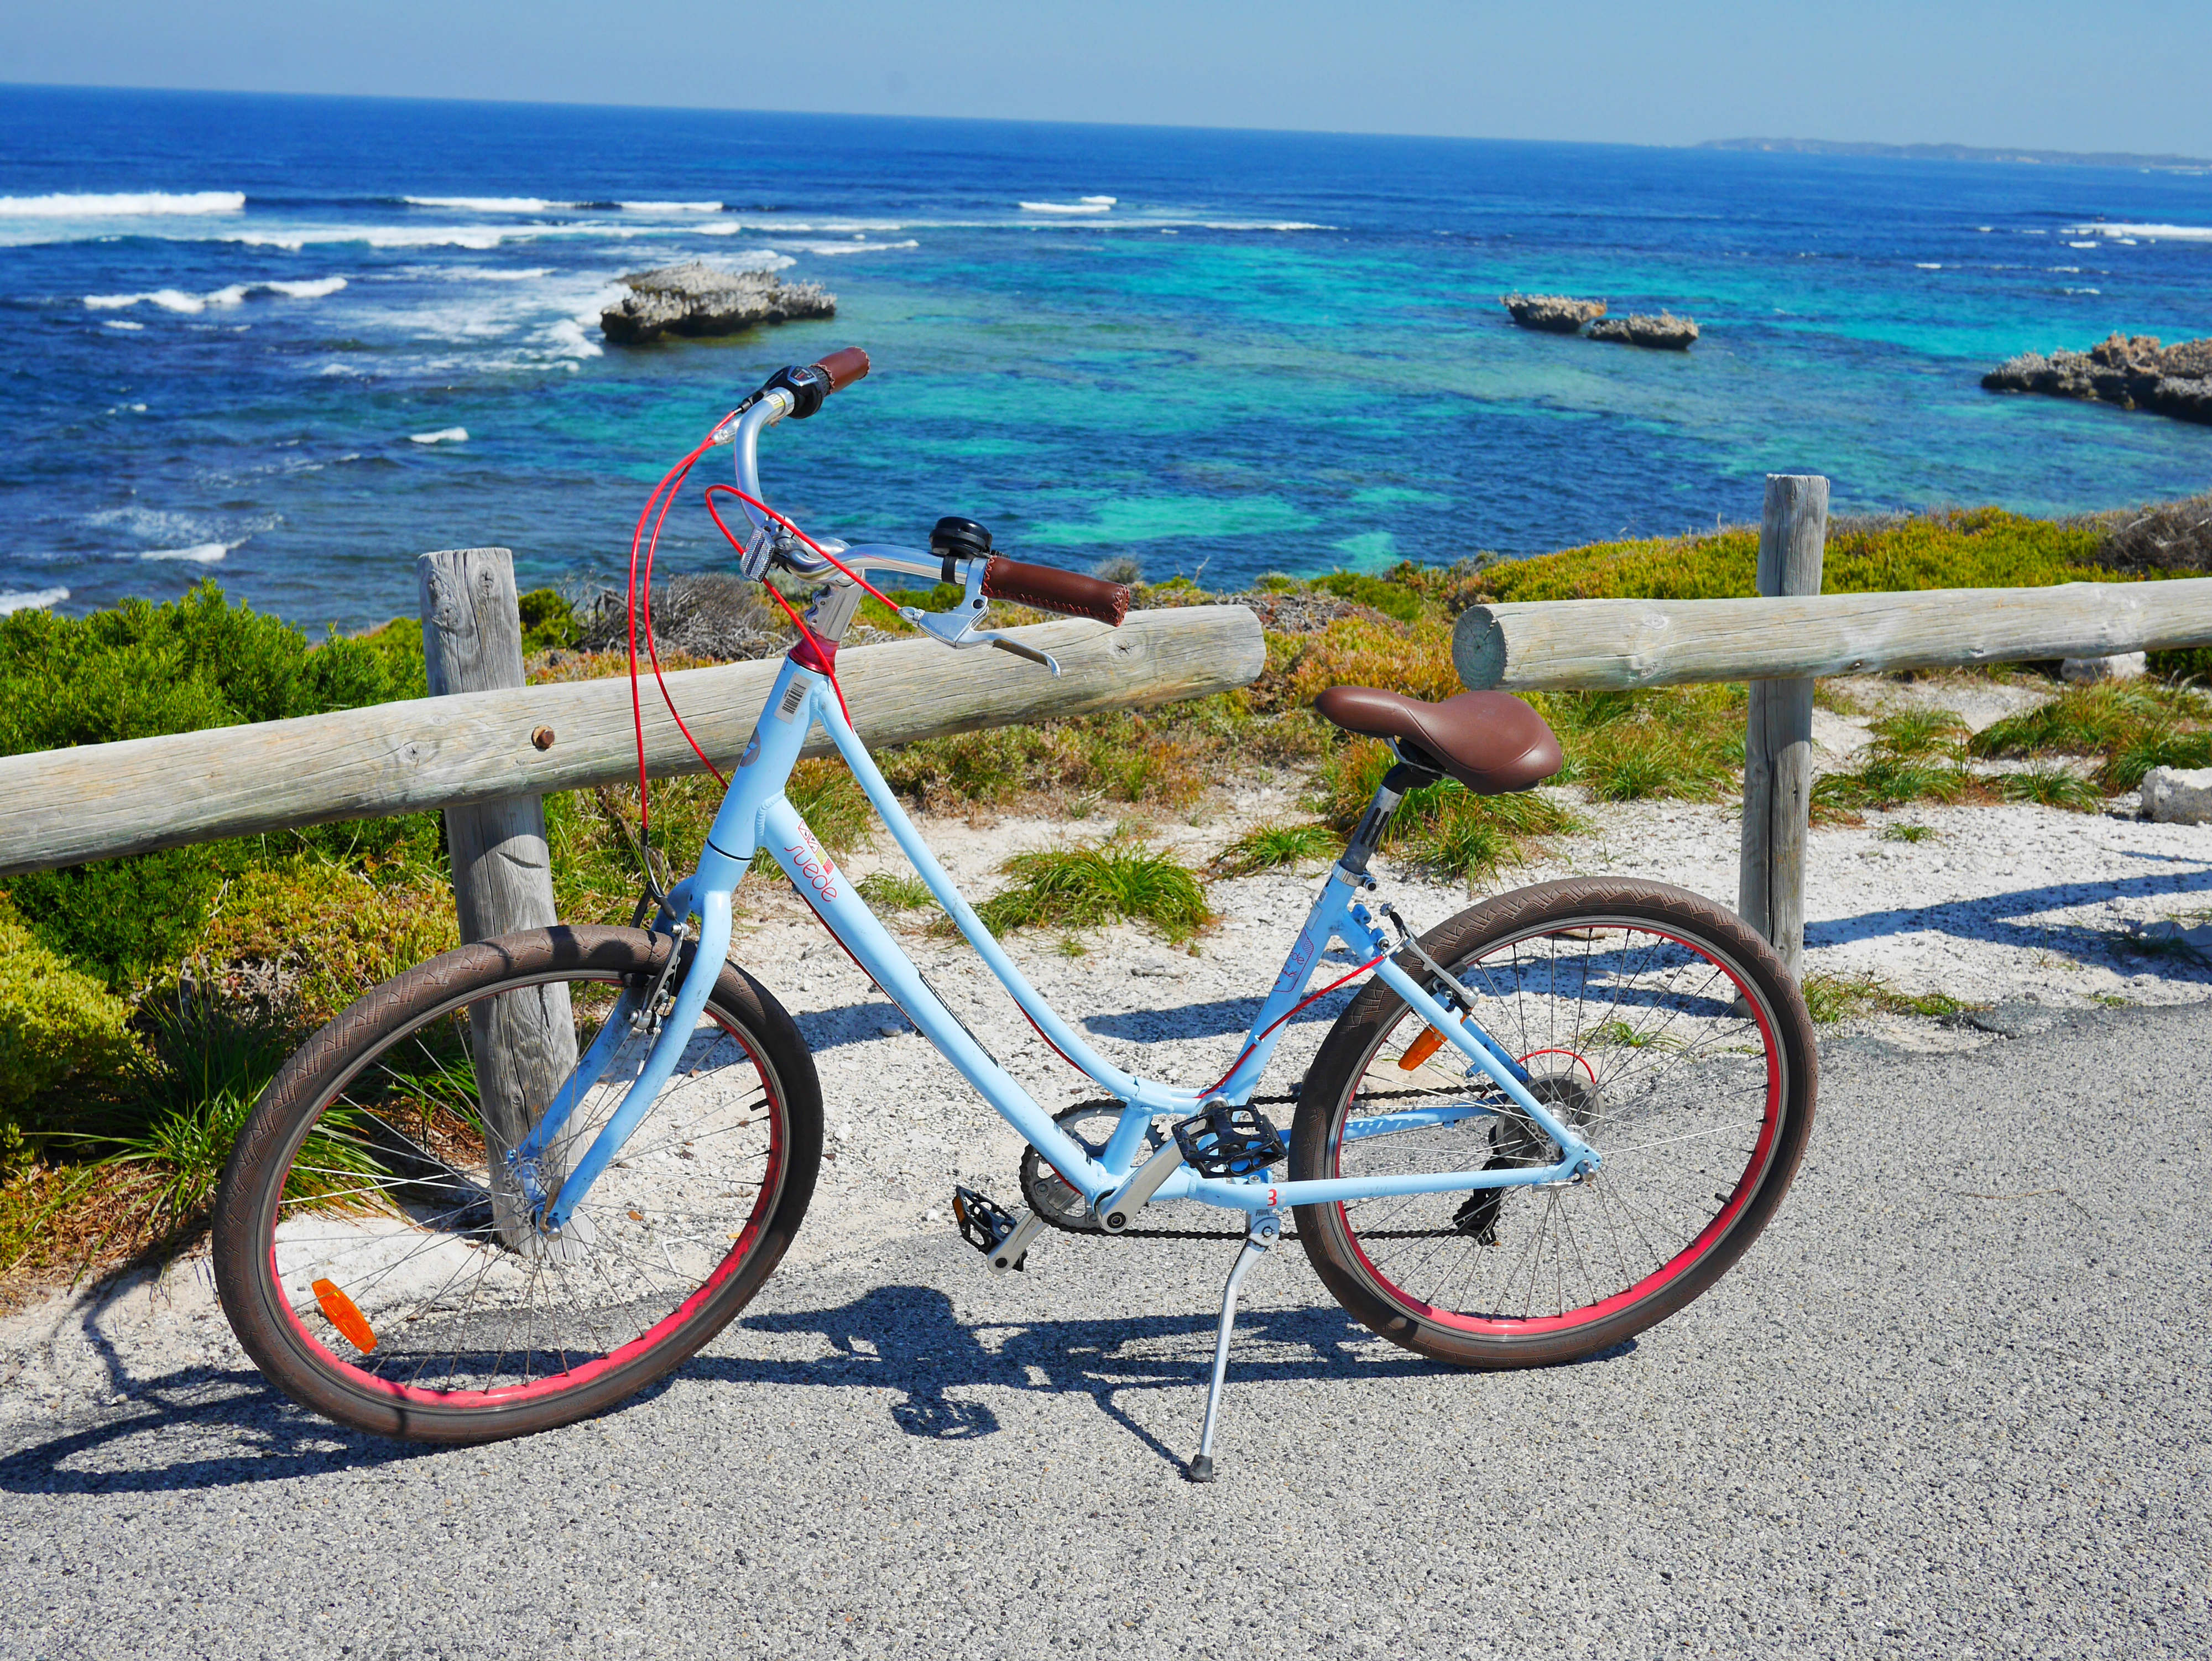 Rottnest Island Day Trip Itinerary